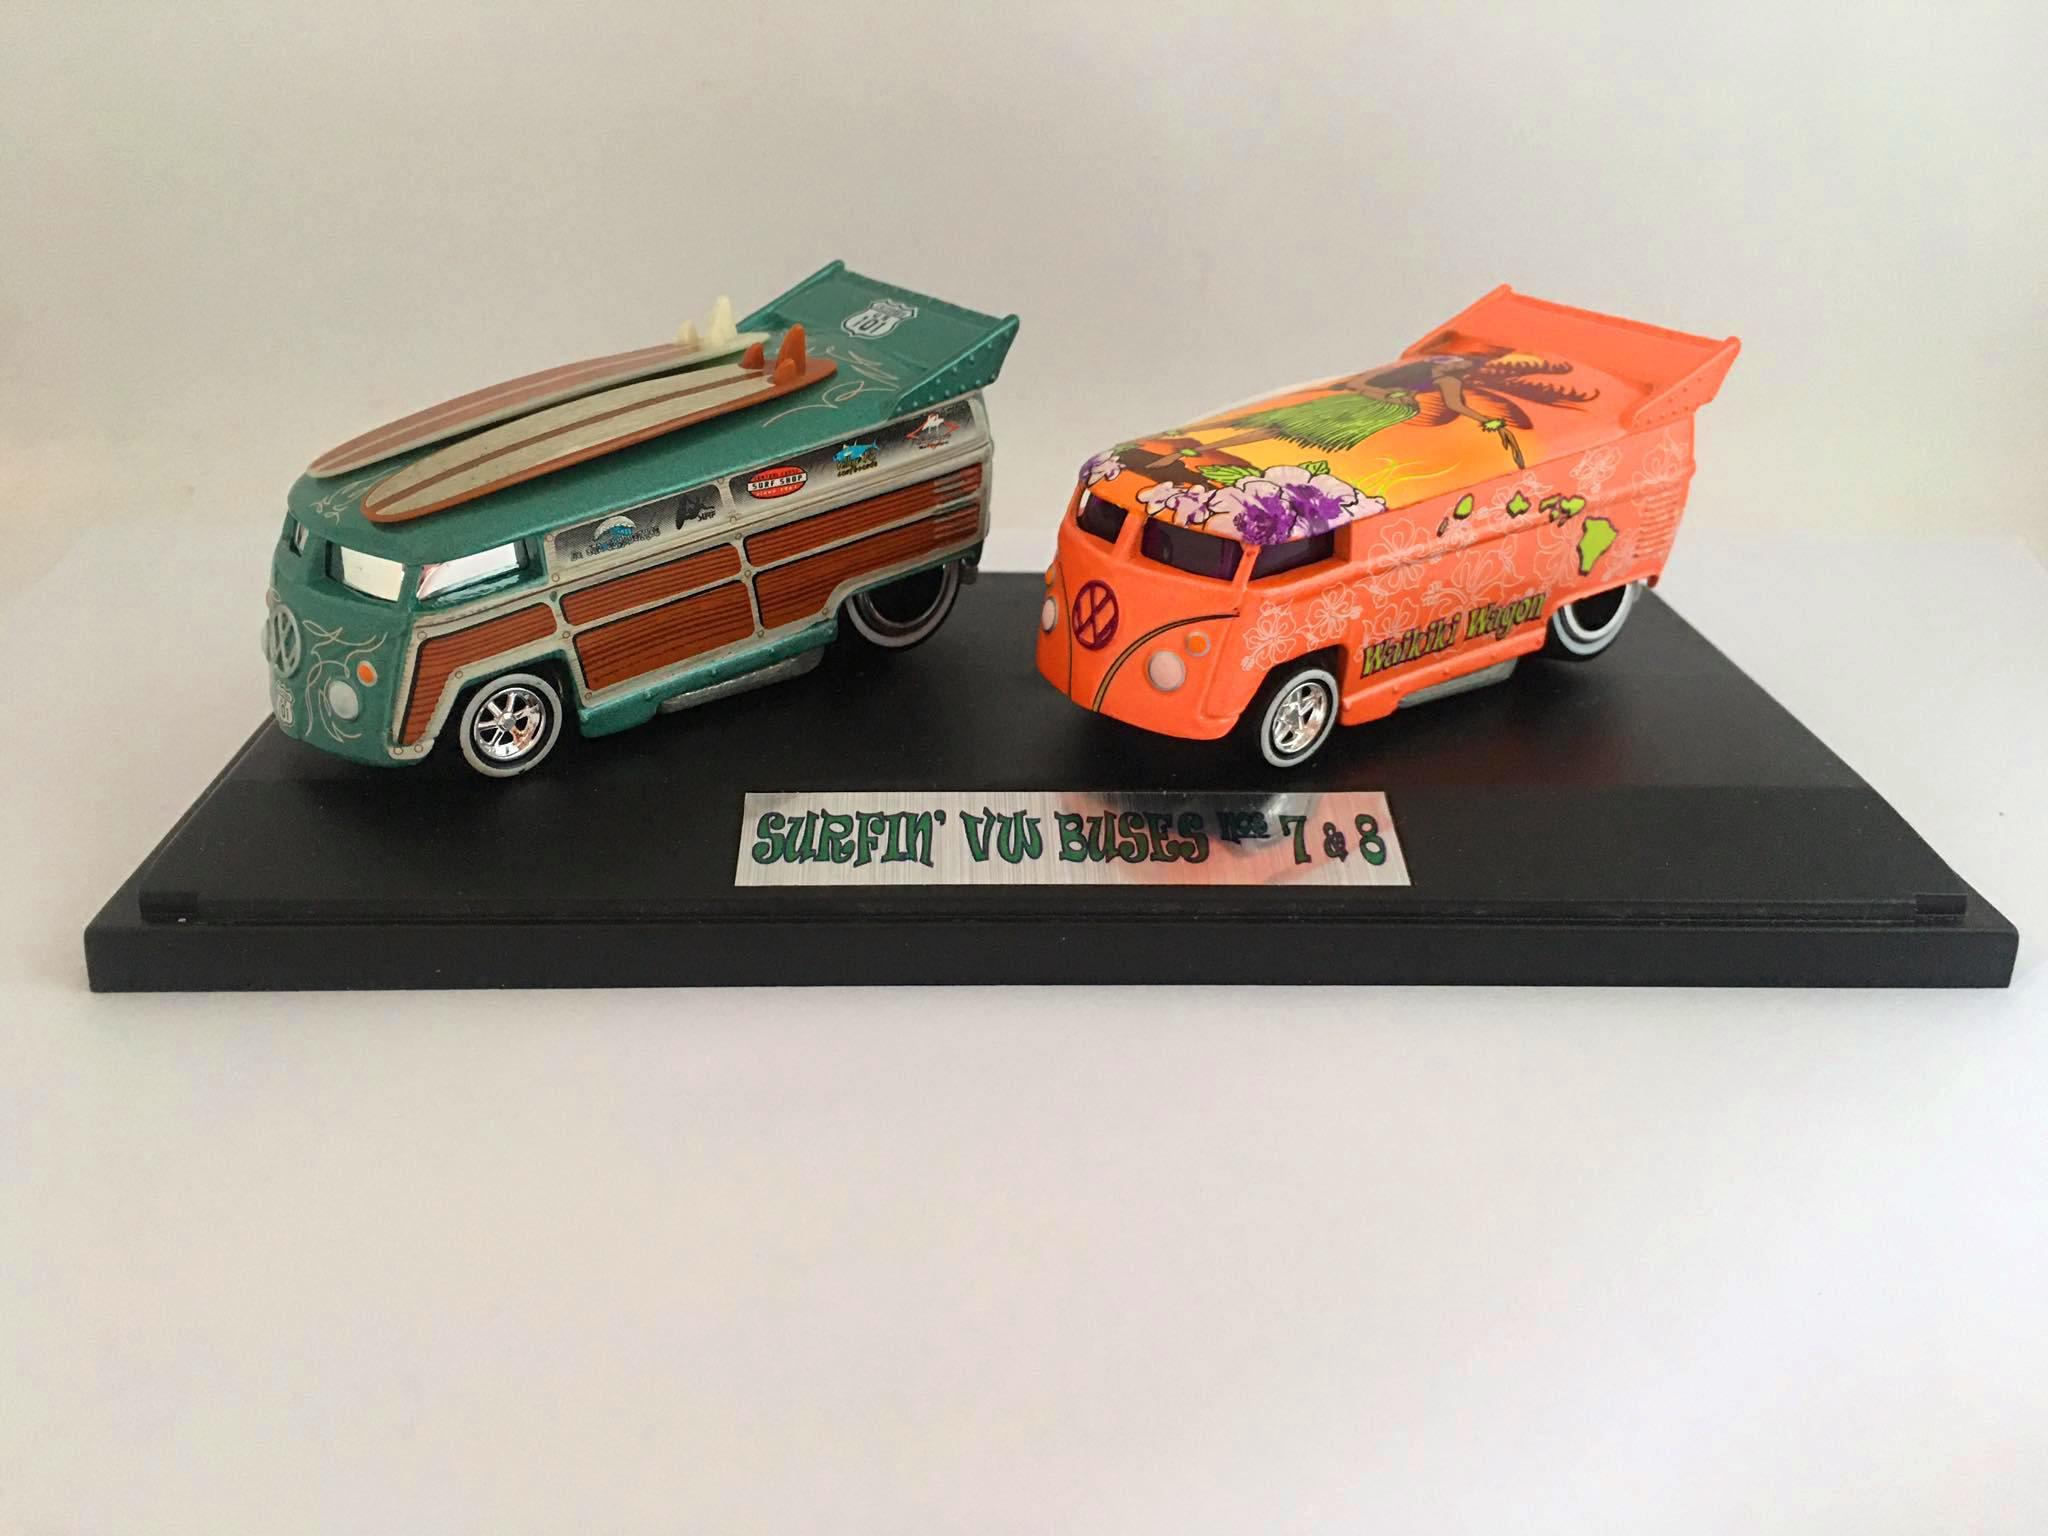 Liberty Promotions - Surfin Series Waikiki Wagon #8 Surfin Series Cal Woodle #7 VW Drag Bus - Limitado em 1300 Peças